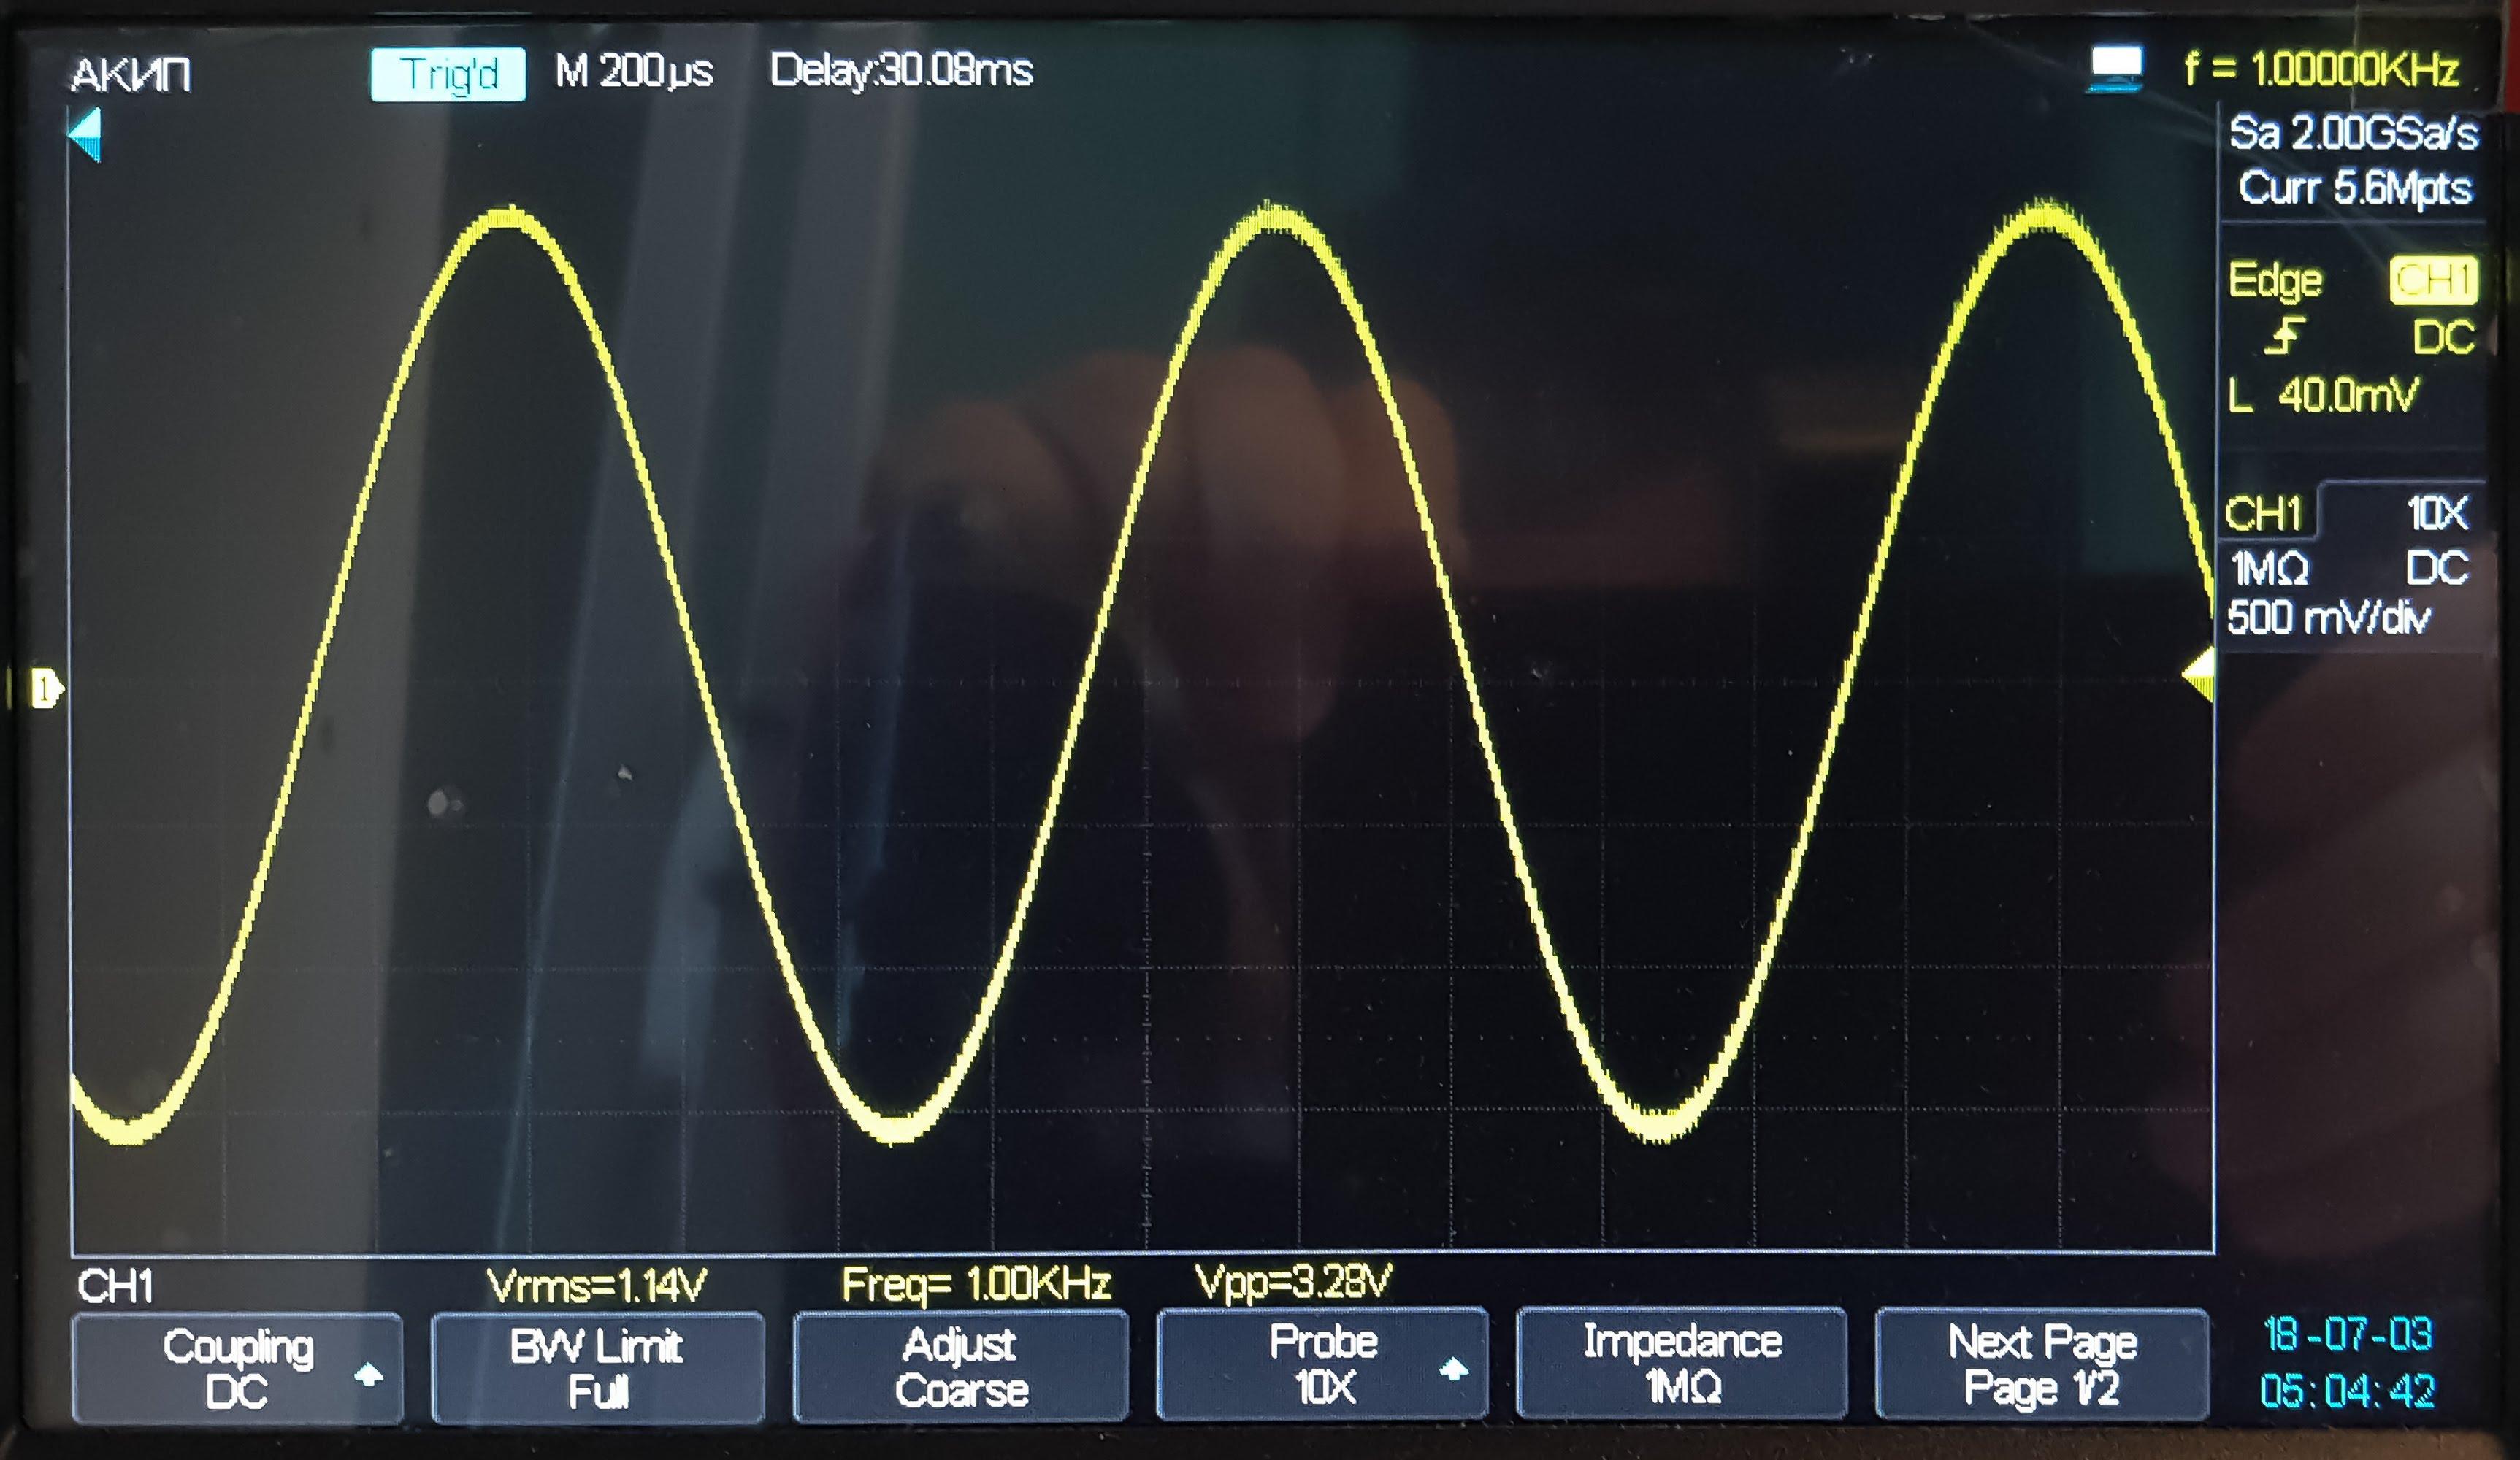 https://sites.google.com/a/lvsystem.ru/lab/kits/eclipse-usb-dac/out-1khz-0db.jpg?attredirects=0